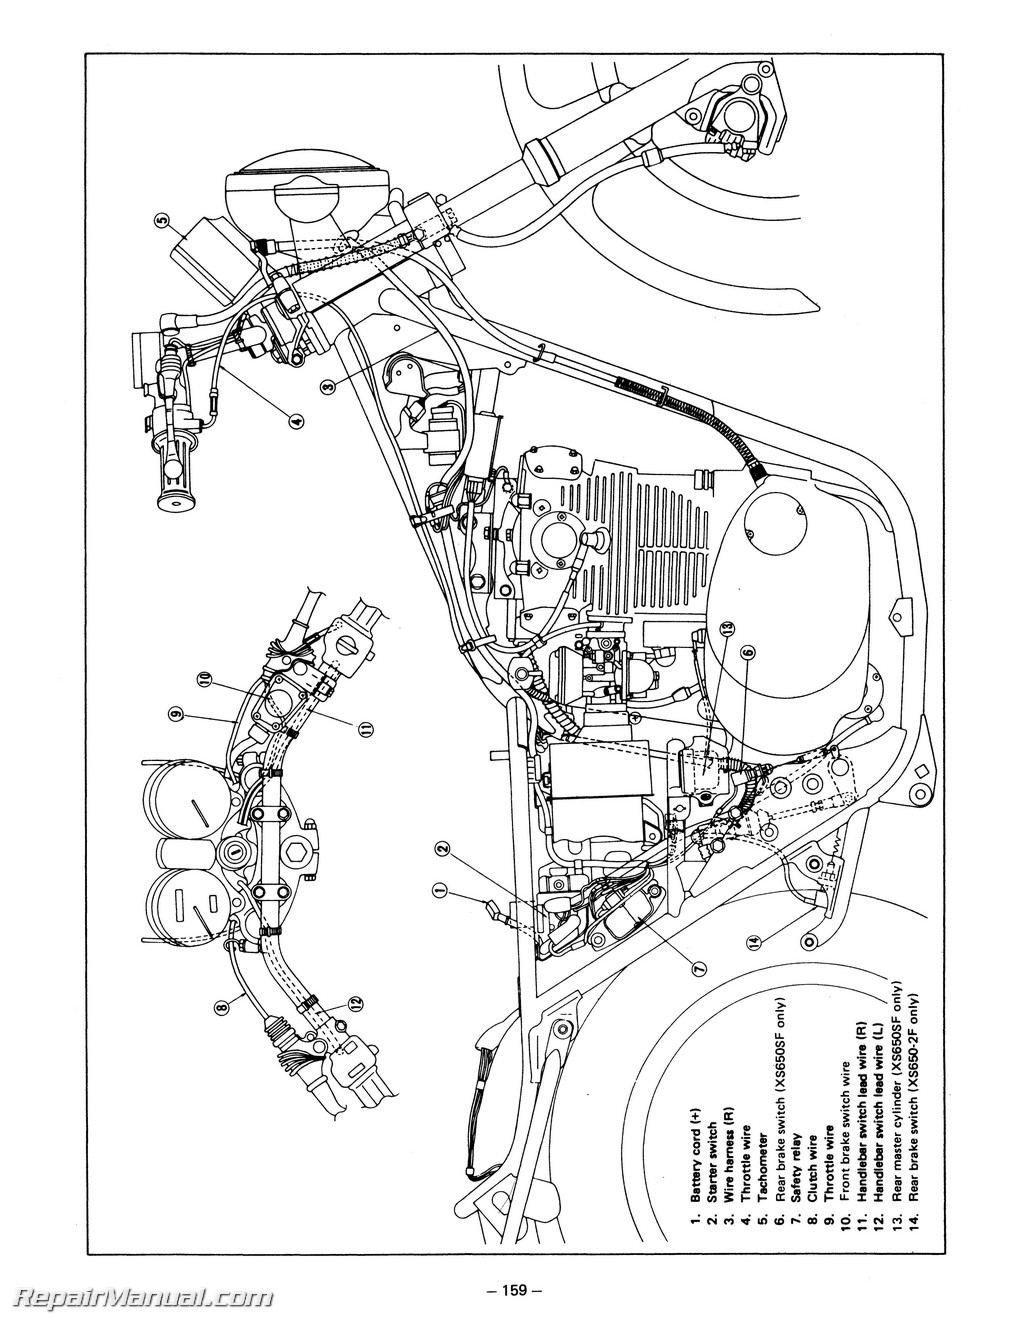 1978 1981 yamaha xs650 service manual rh repairmanual master cylinder diagram how works chevy master